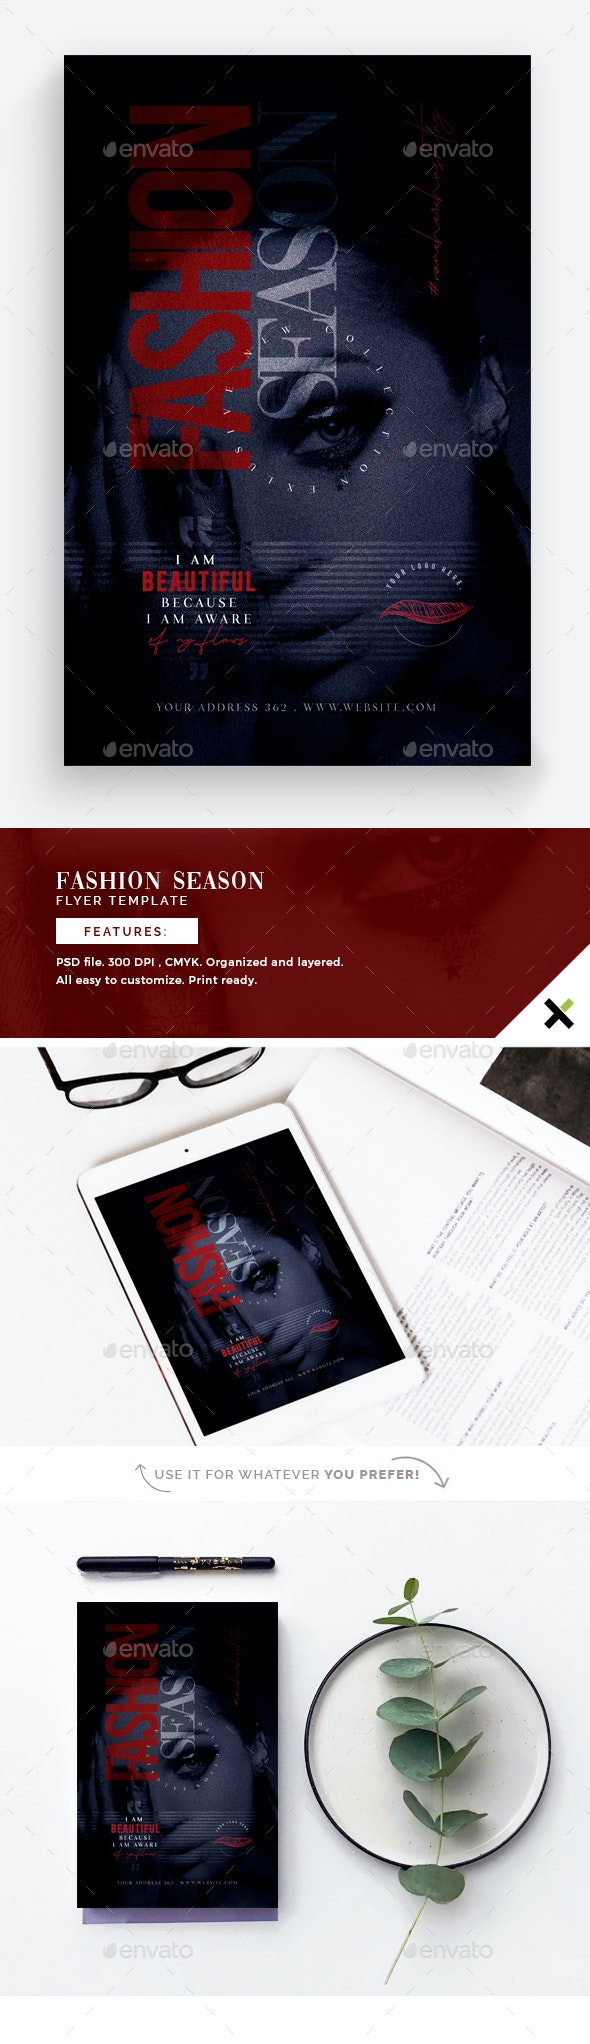 Fashion Season Flyer Template - Flyers Print Templates